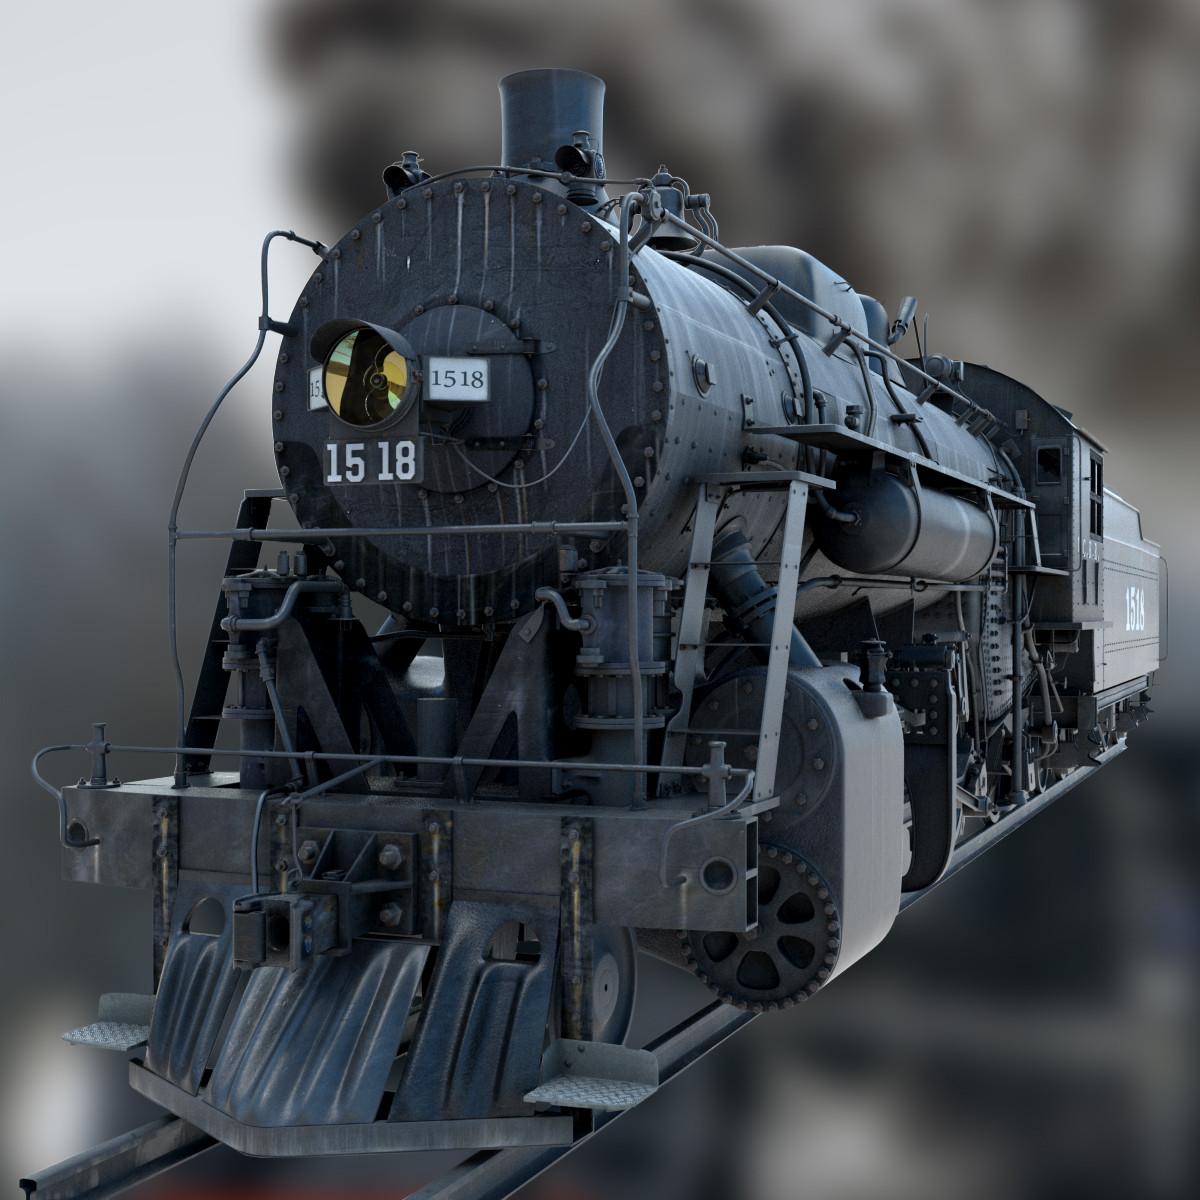 Steamtrain_2014_001_02.jpg